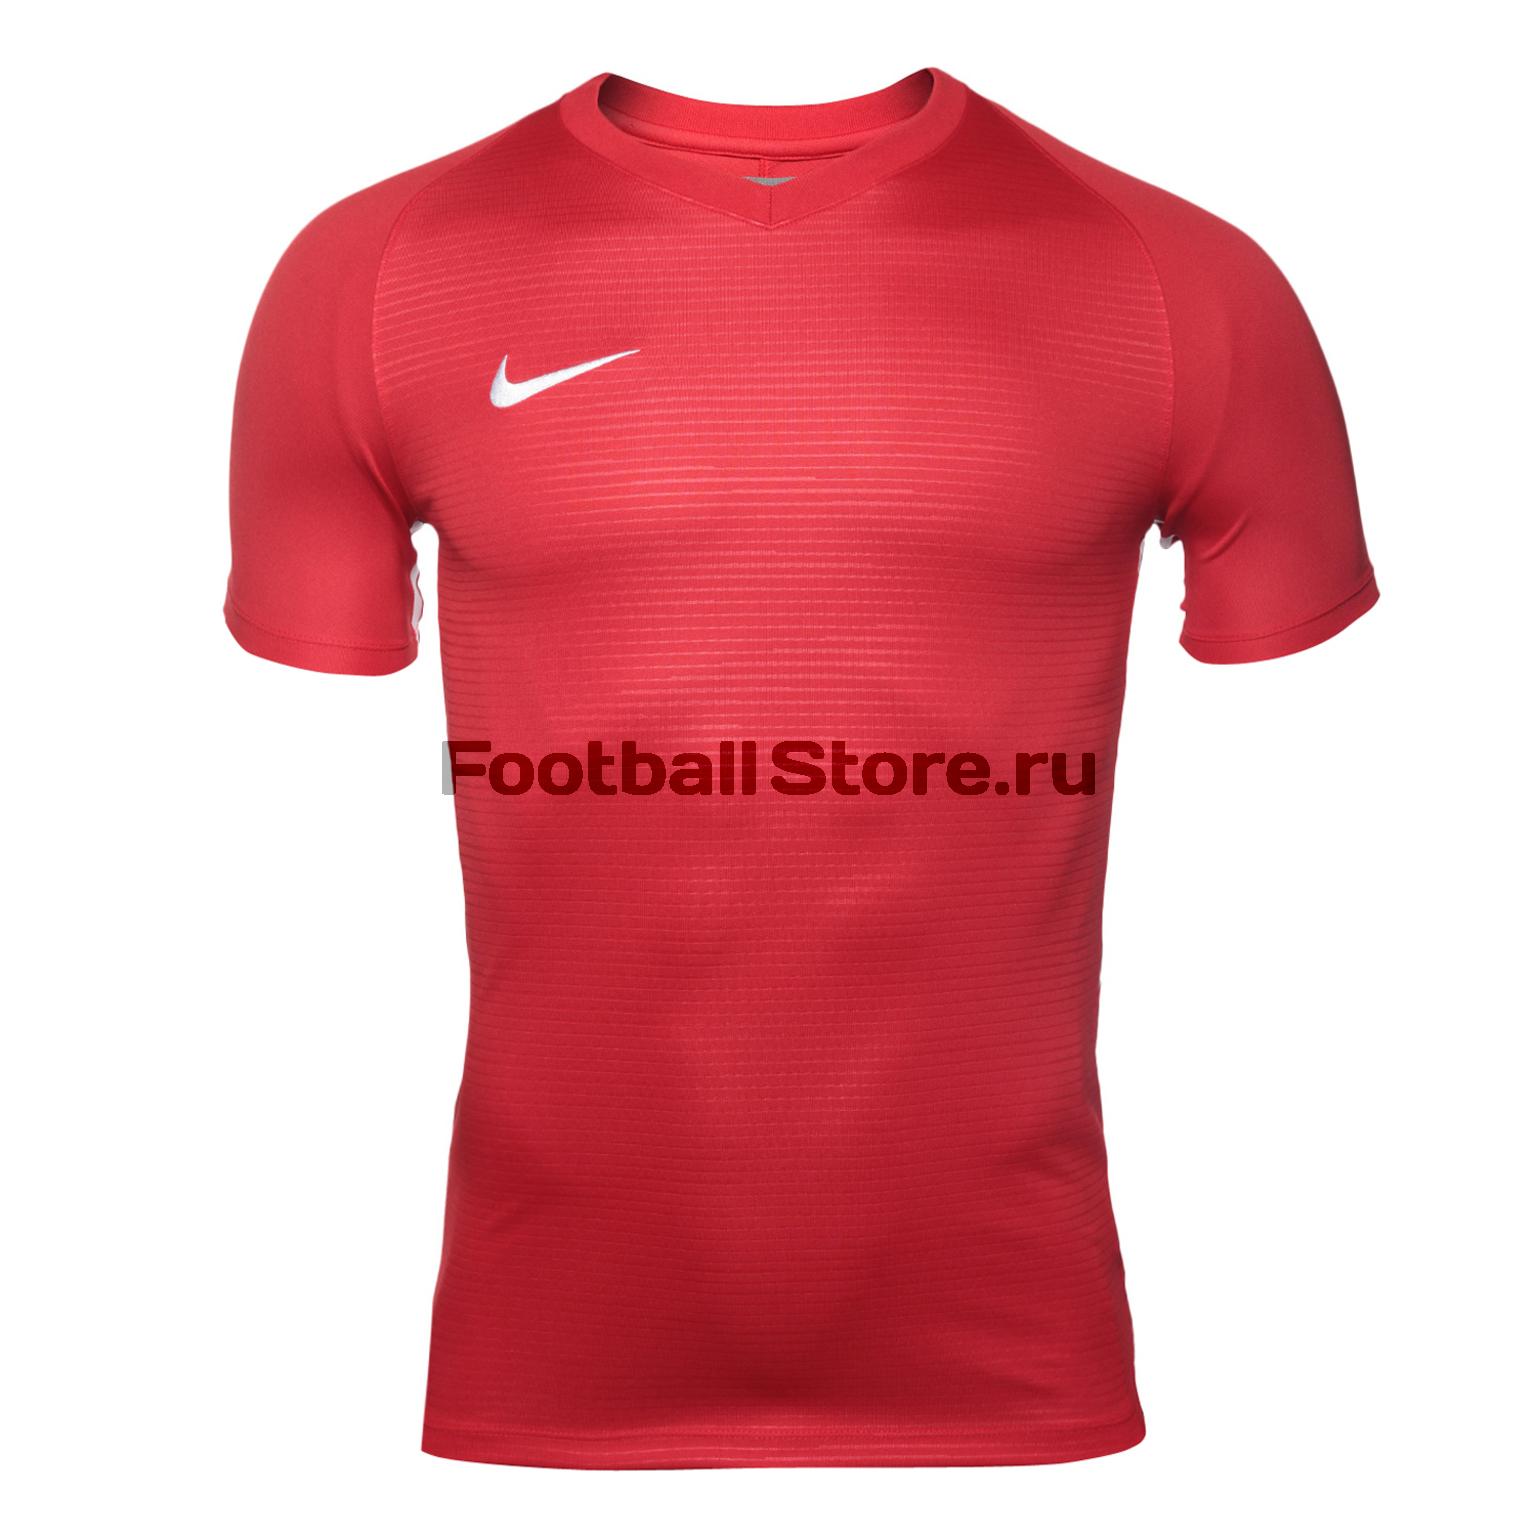 Футболка игровая Nike Dry Tiempo Prem JSY SS 894230-657 nike футболка zenit ss h a stadium jsy